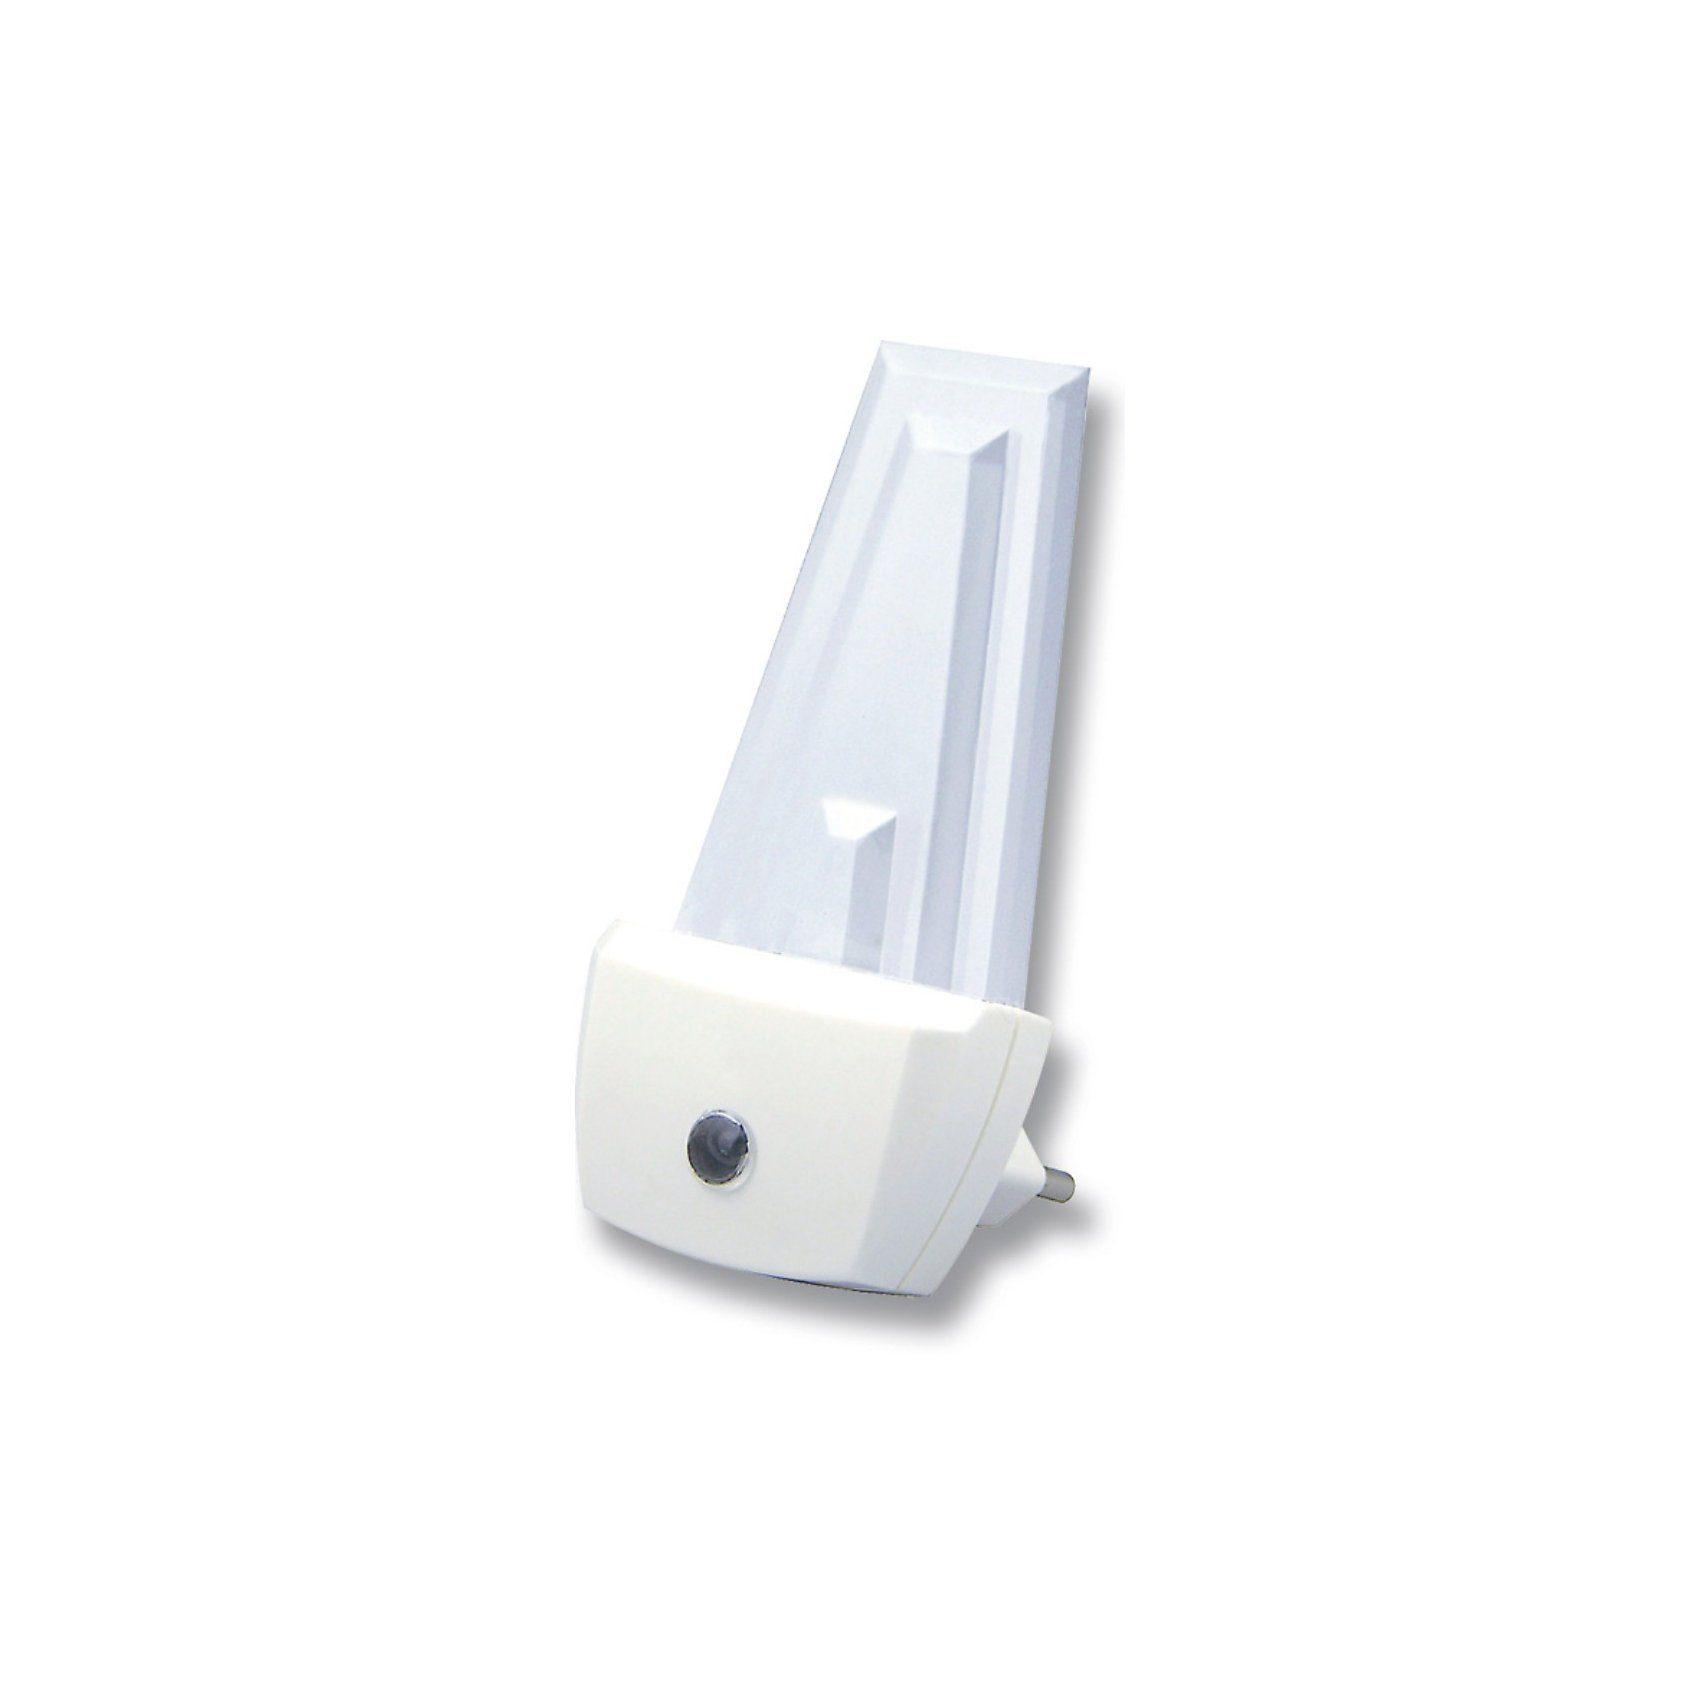 H + H babyruf LED Nachtlicht NL 230